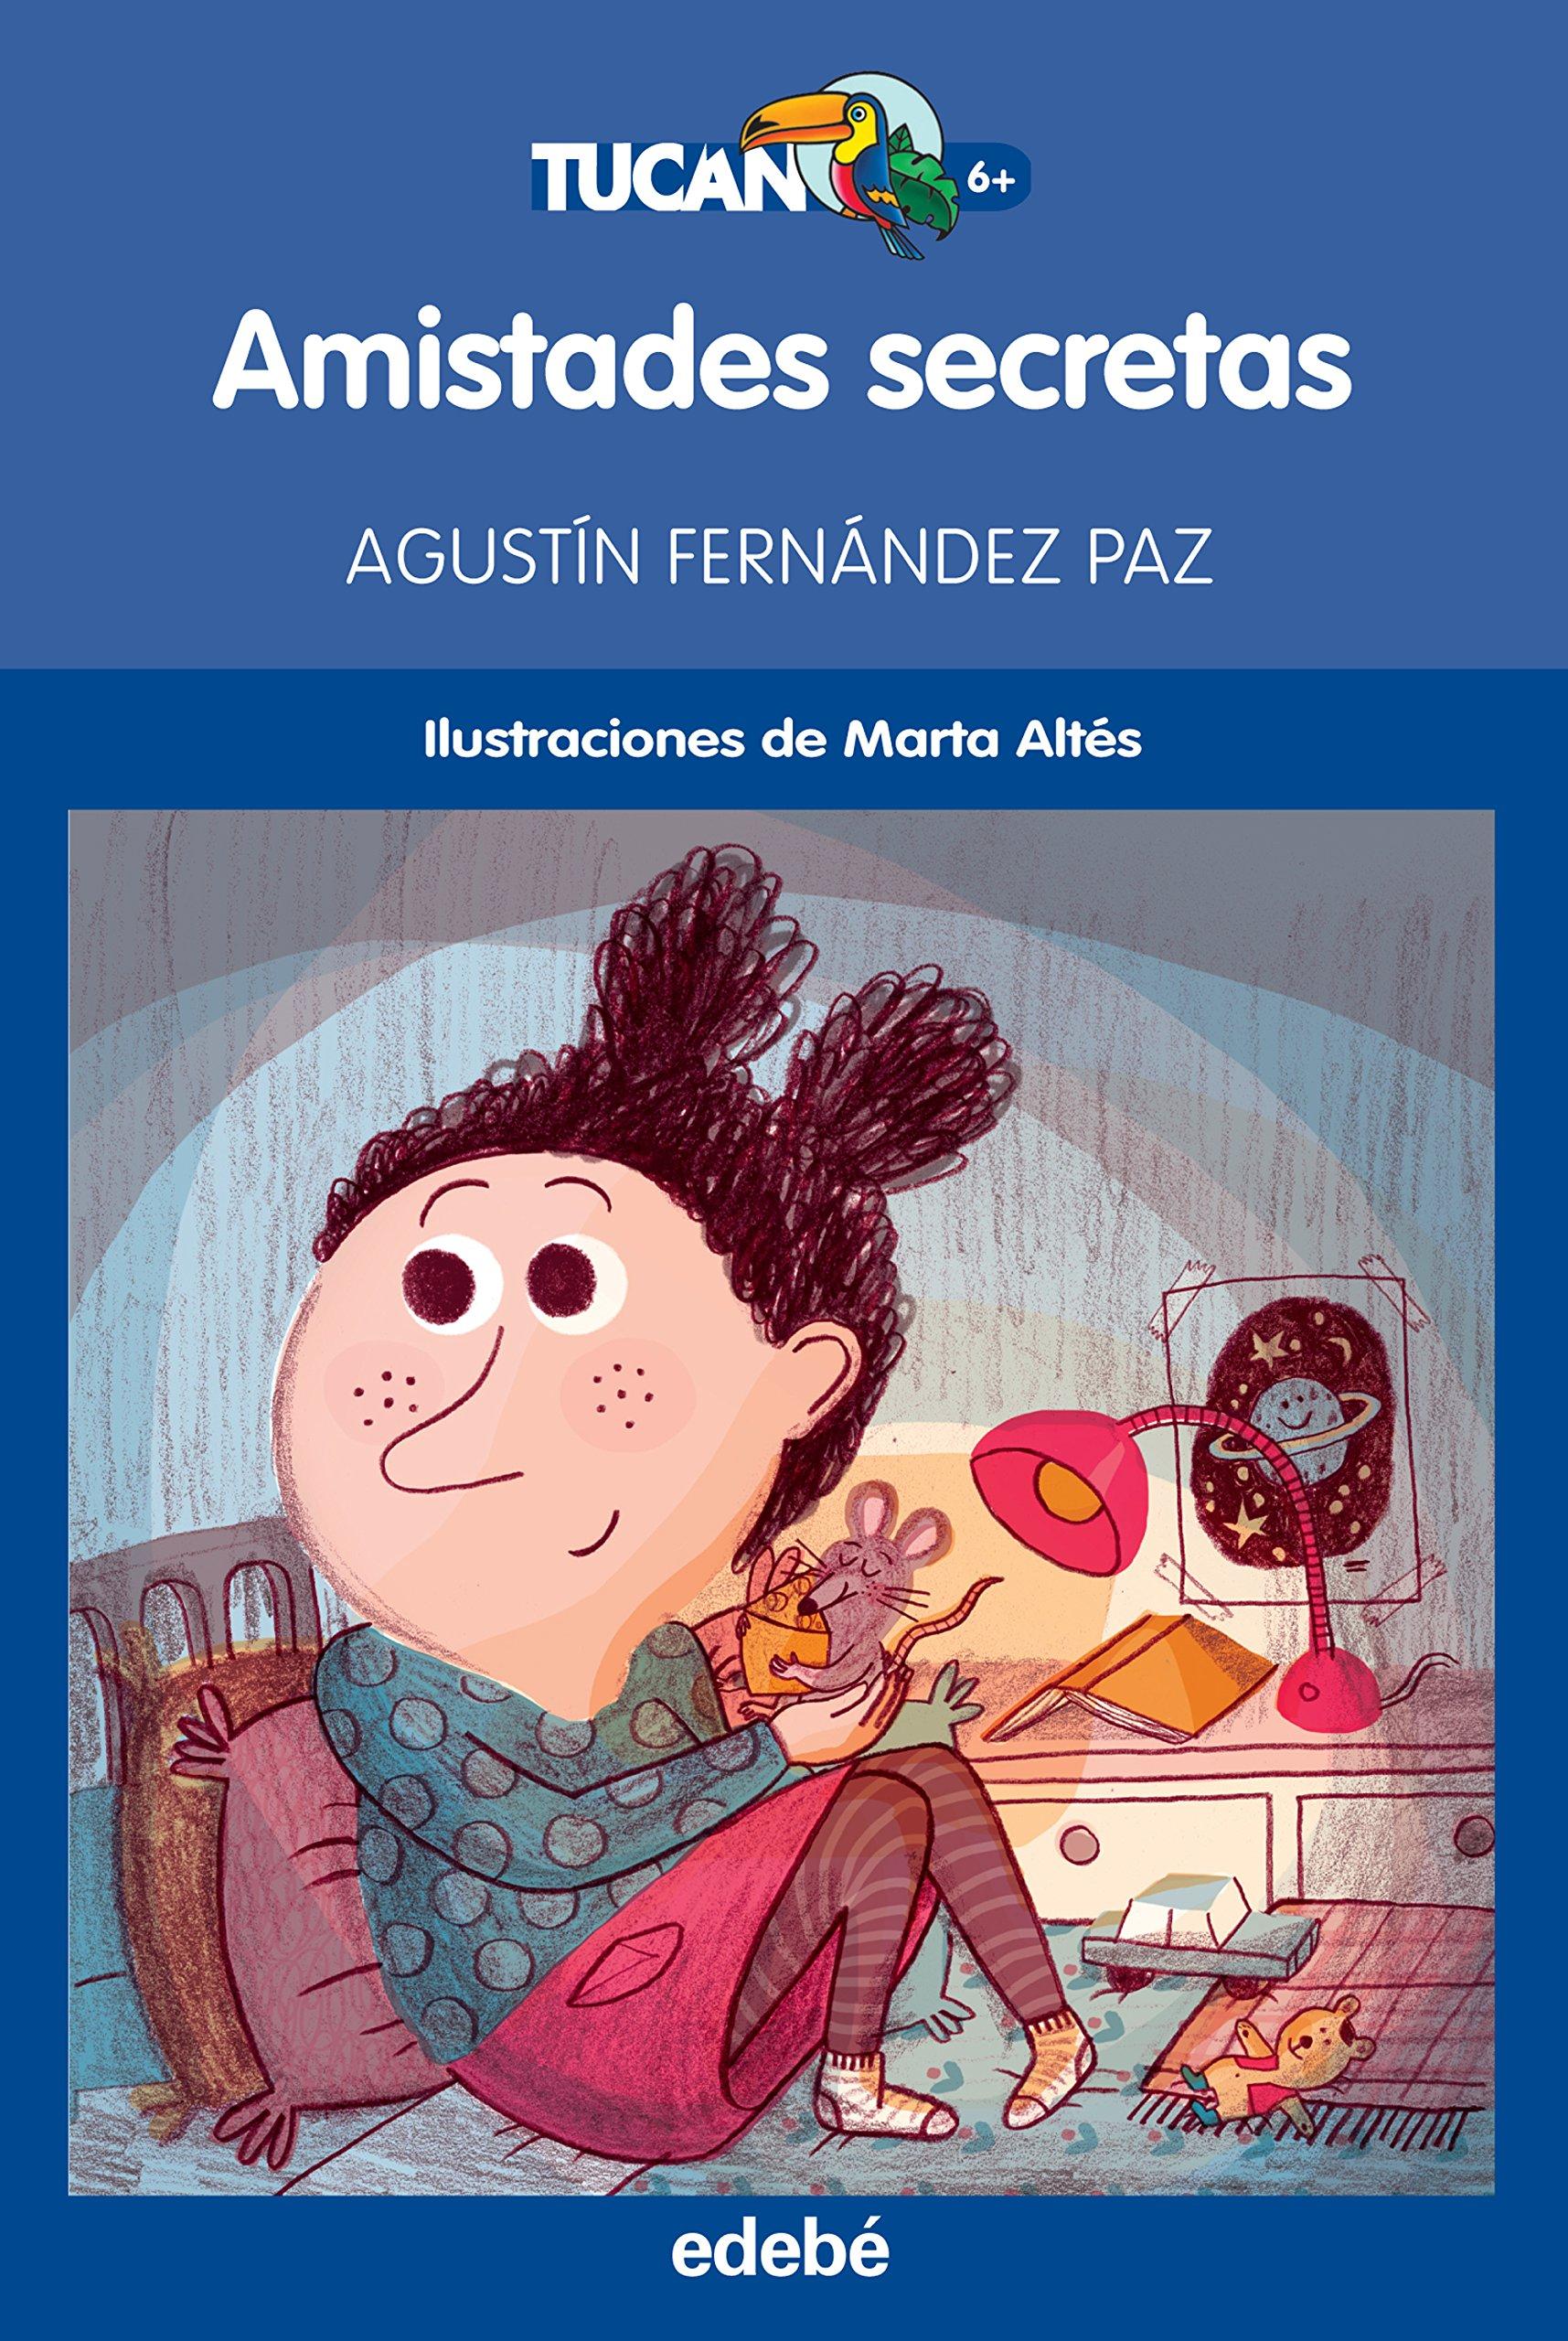 Amistades secretas de Agustín Fernández Paz